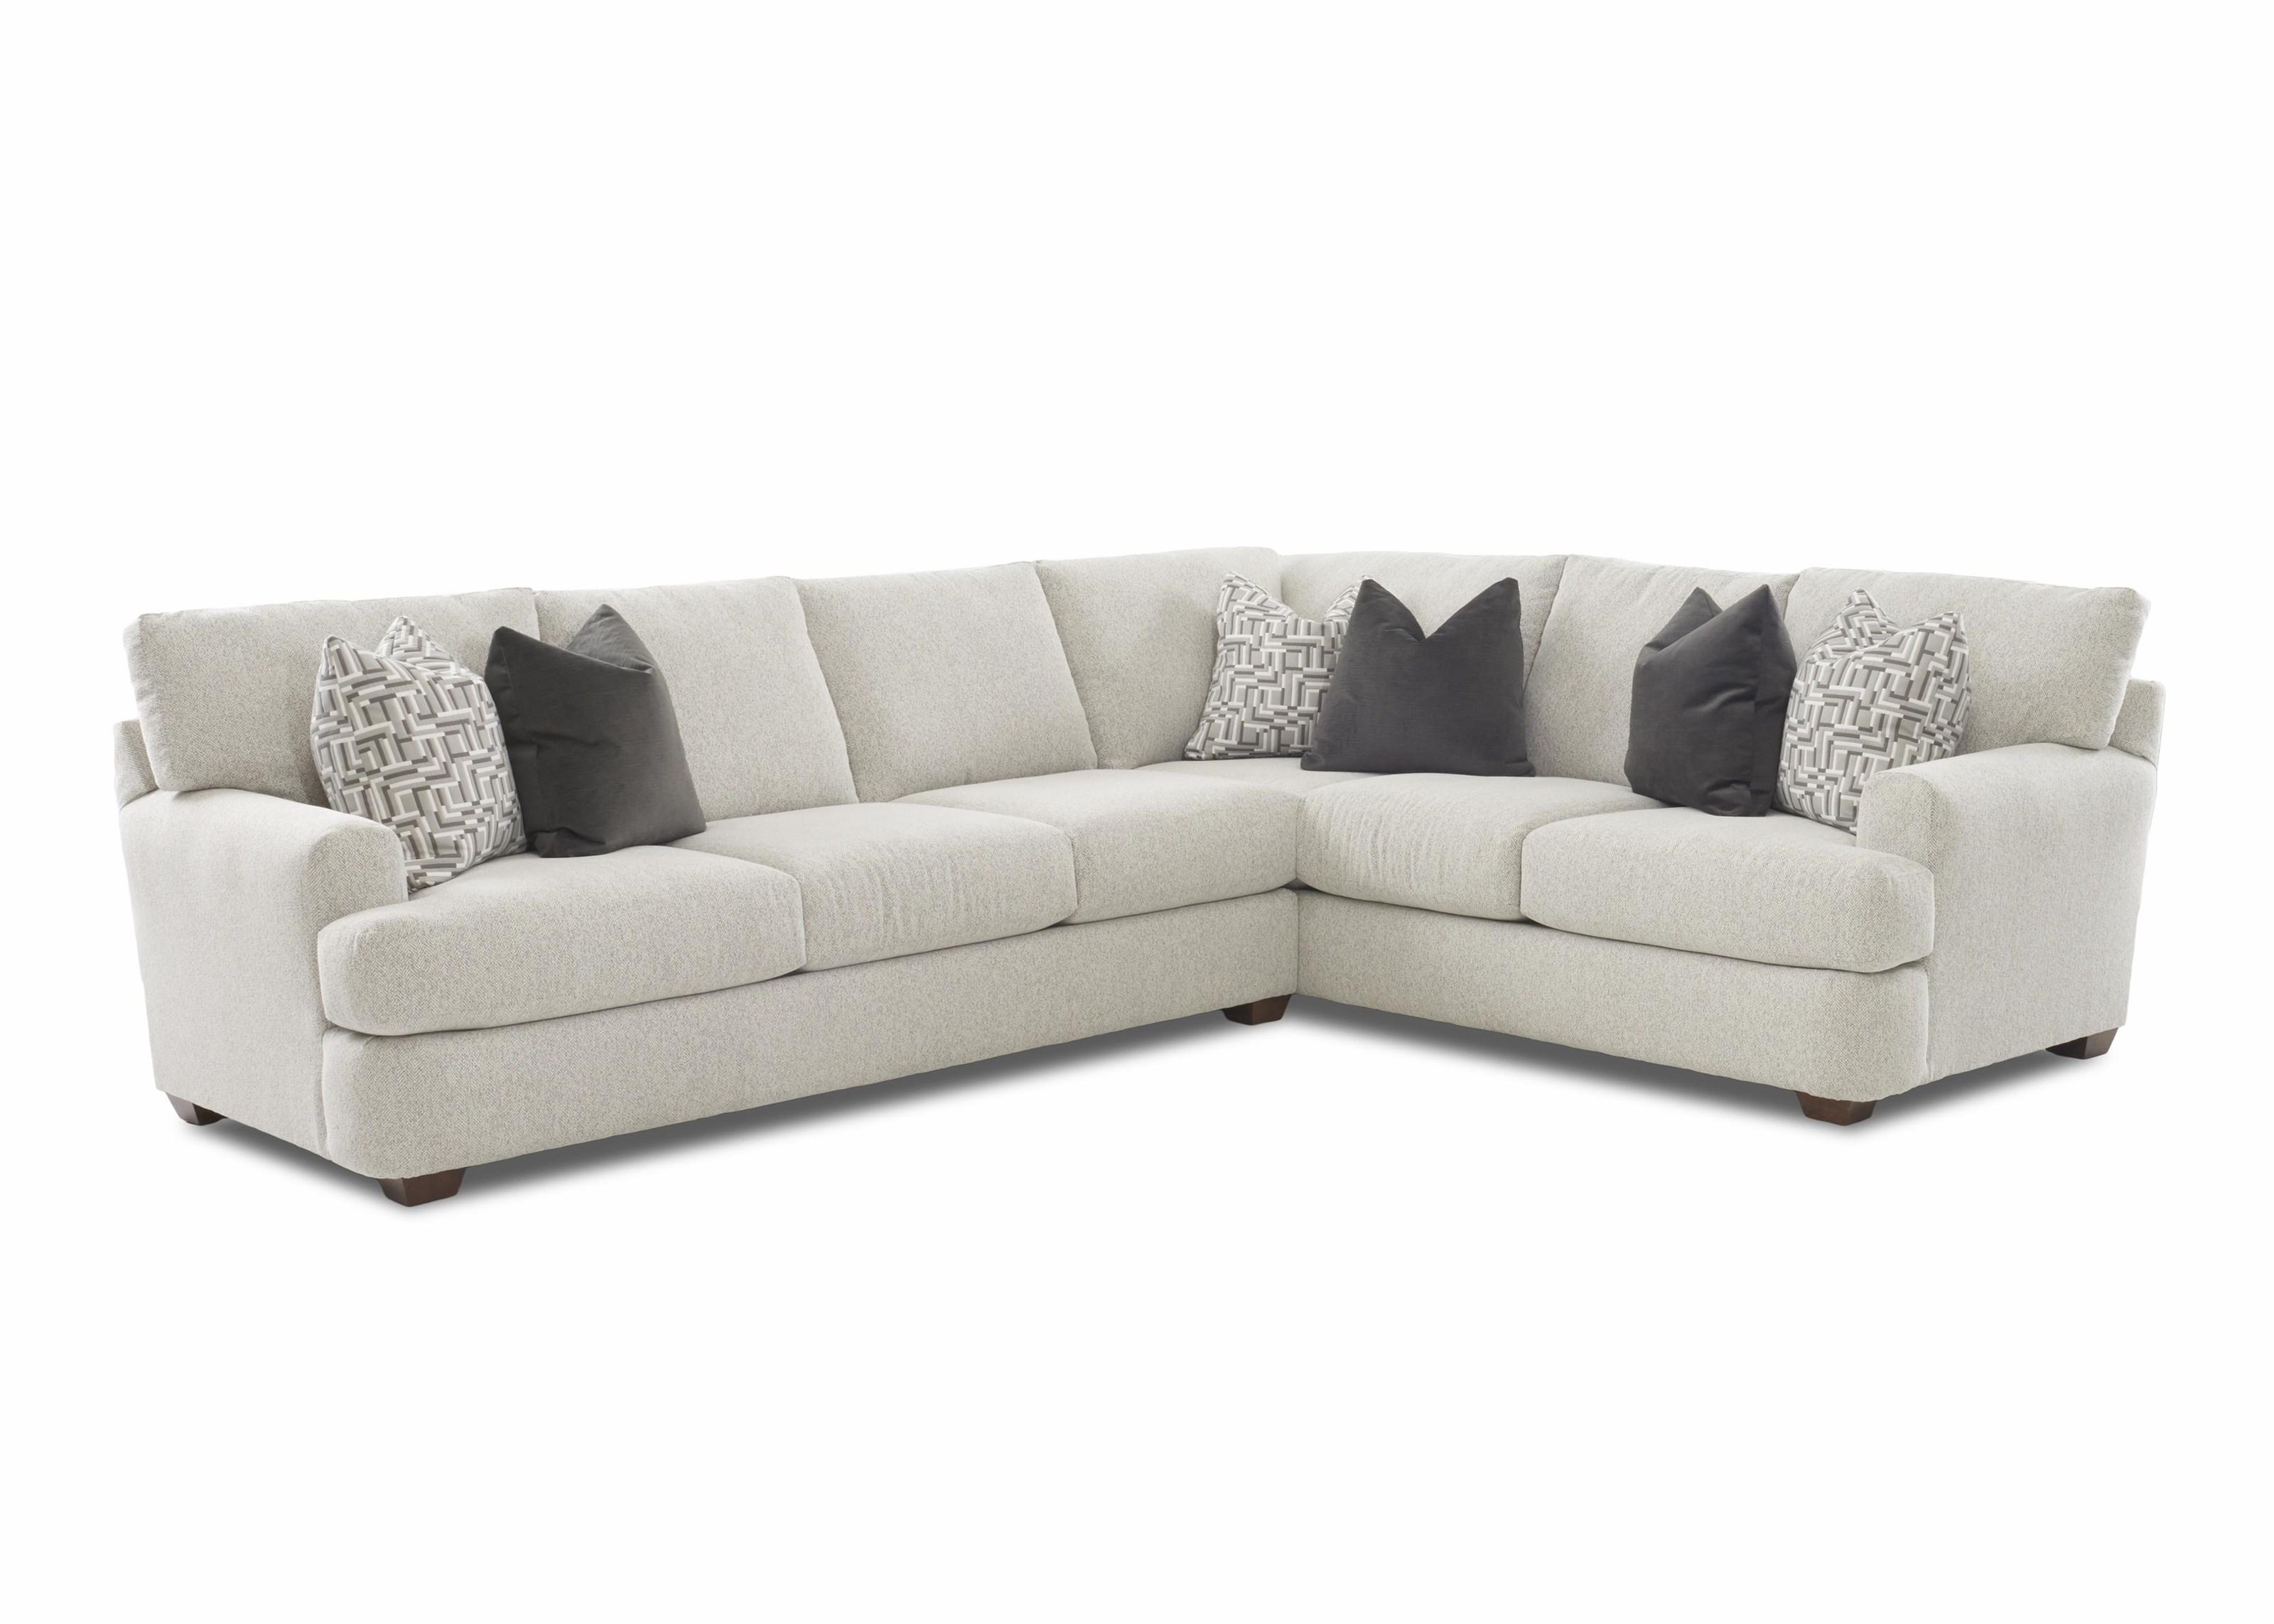 klaussner haynes k18400rcnrs k18400ls 2 piece sectional dunk rh dunkandbright com klaussner furniture sectional sofa klaussner sectional couches